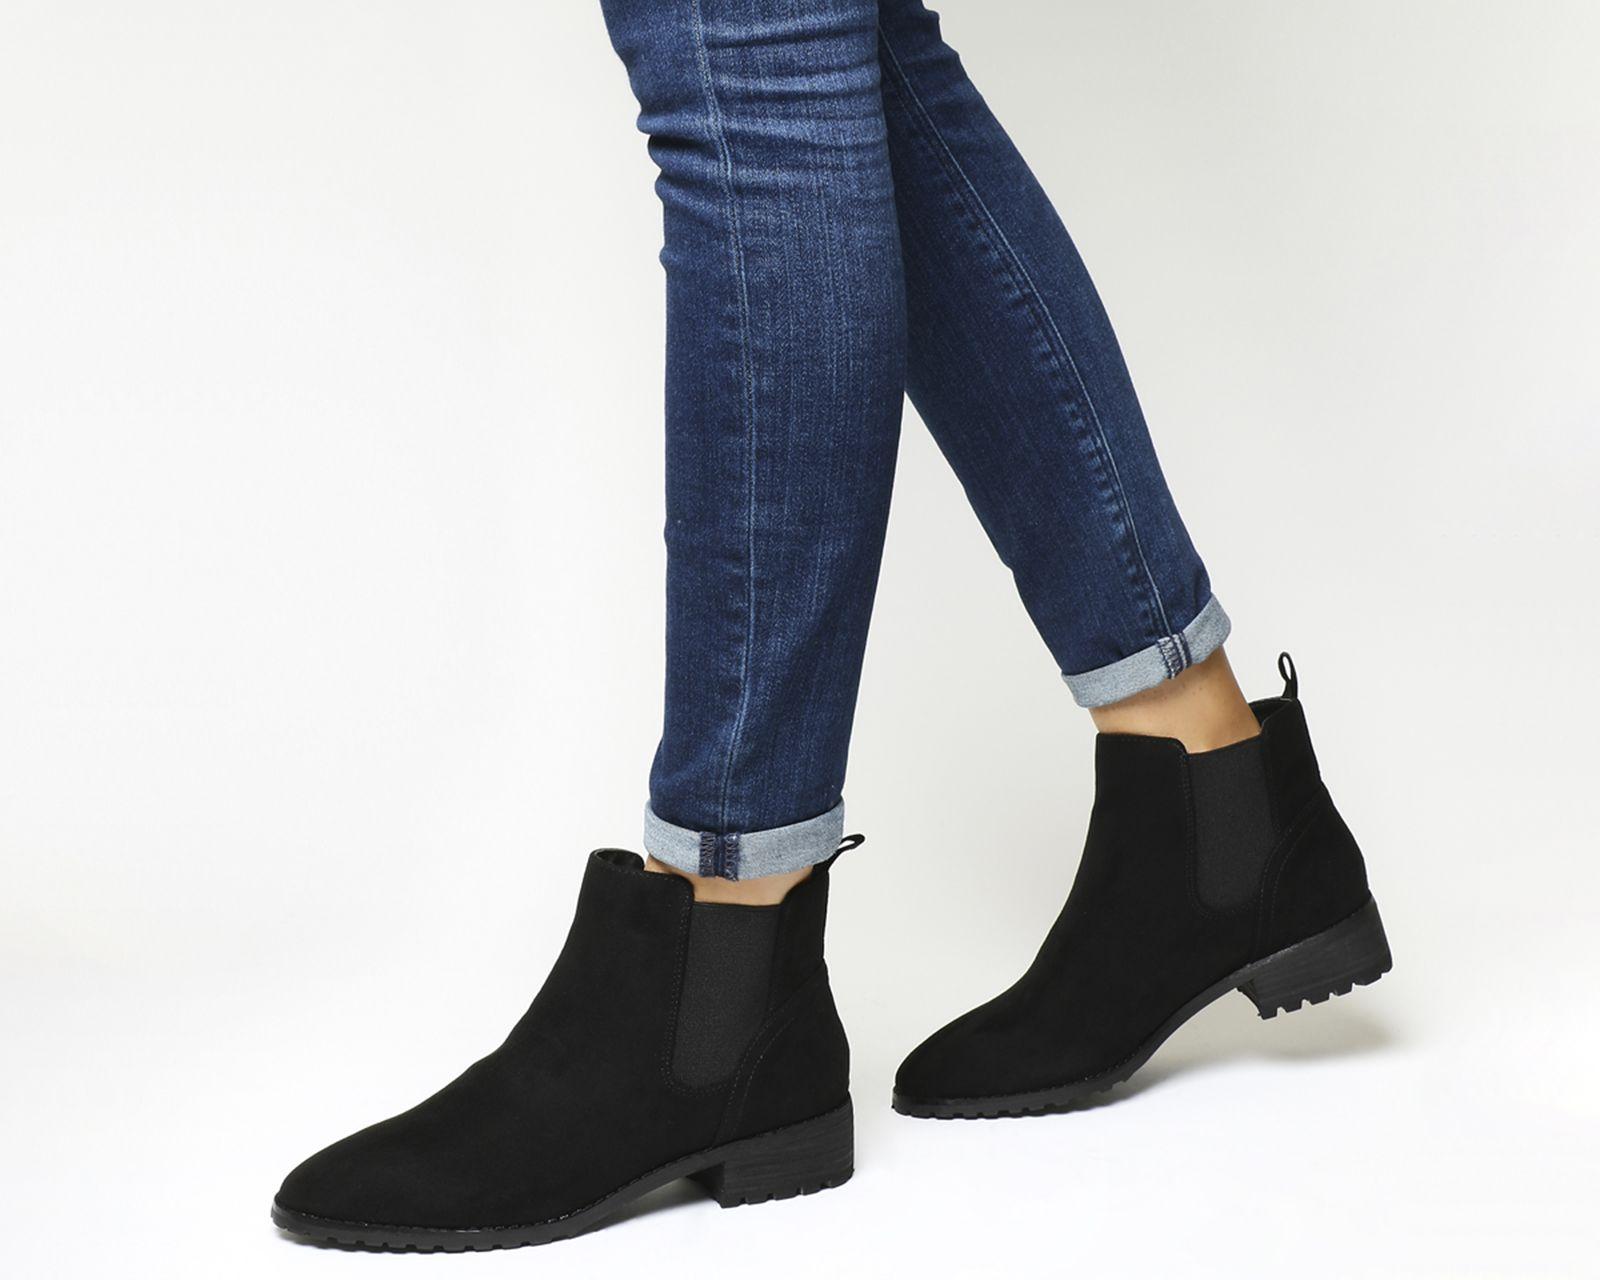 Office Allie Chelsea Boot Black - Ankle